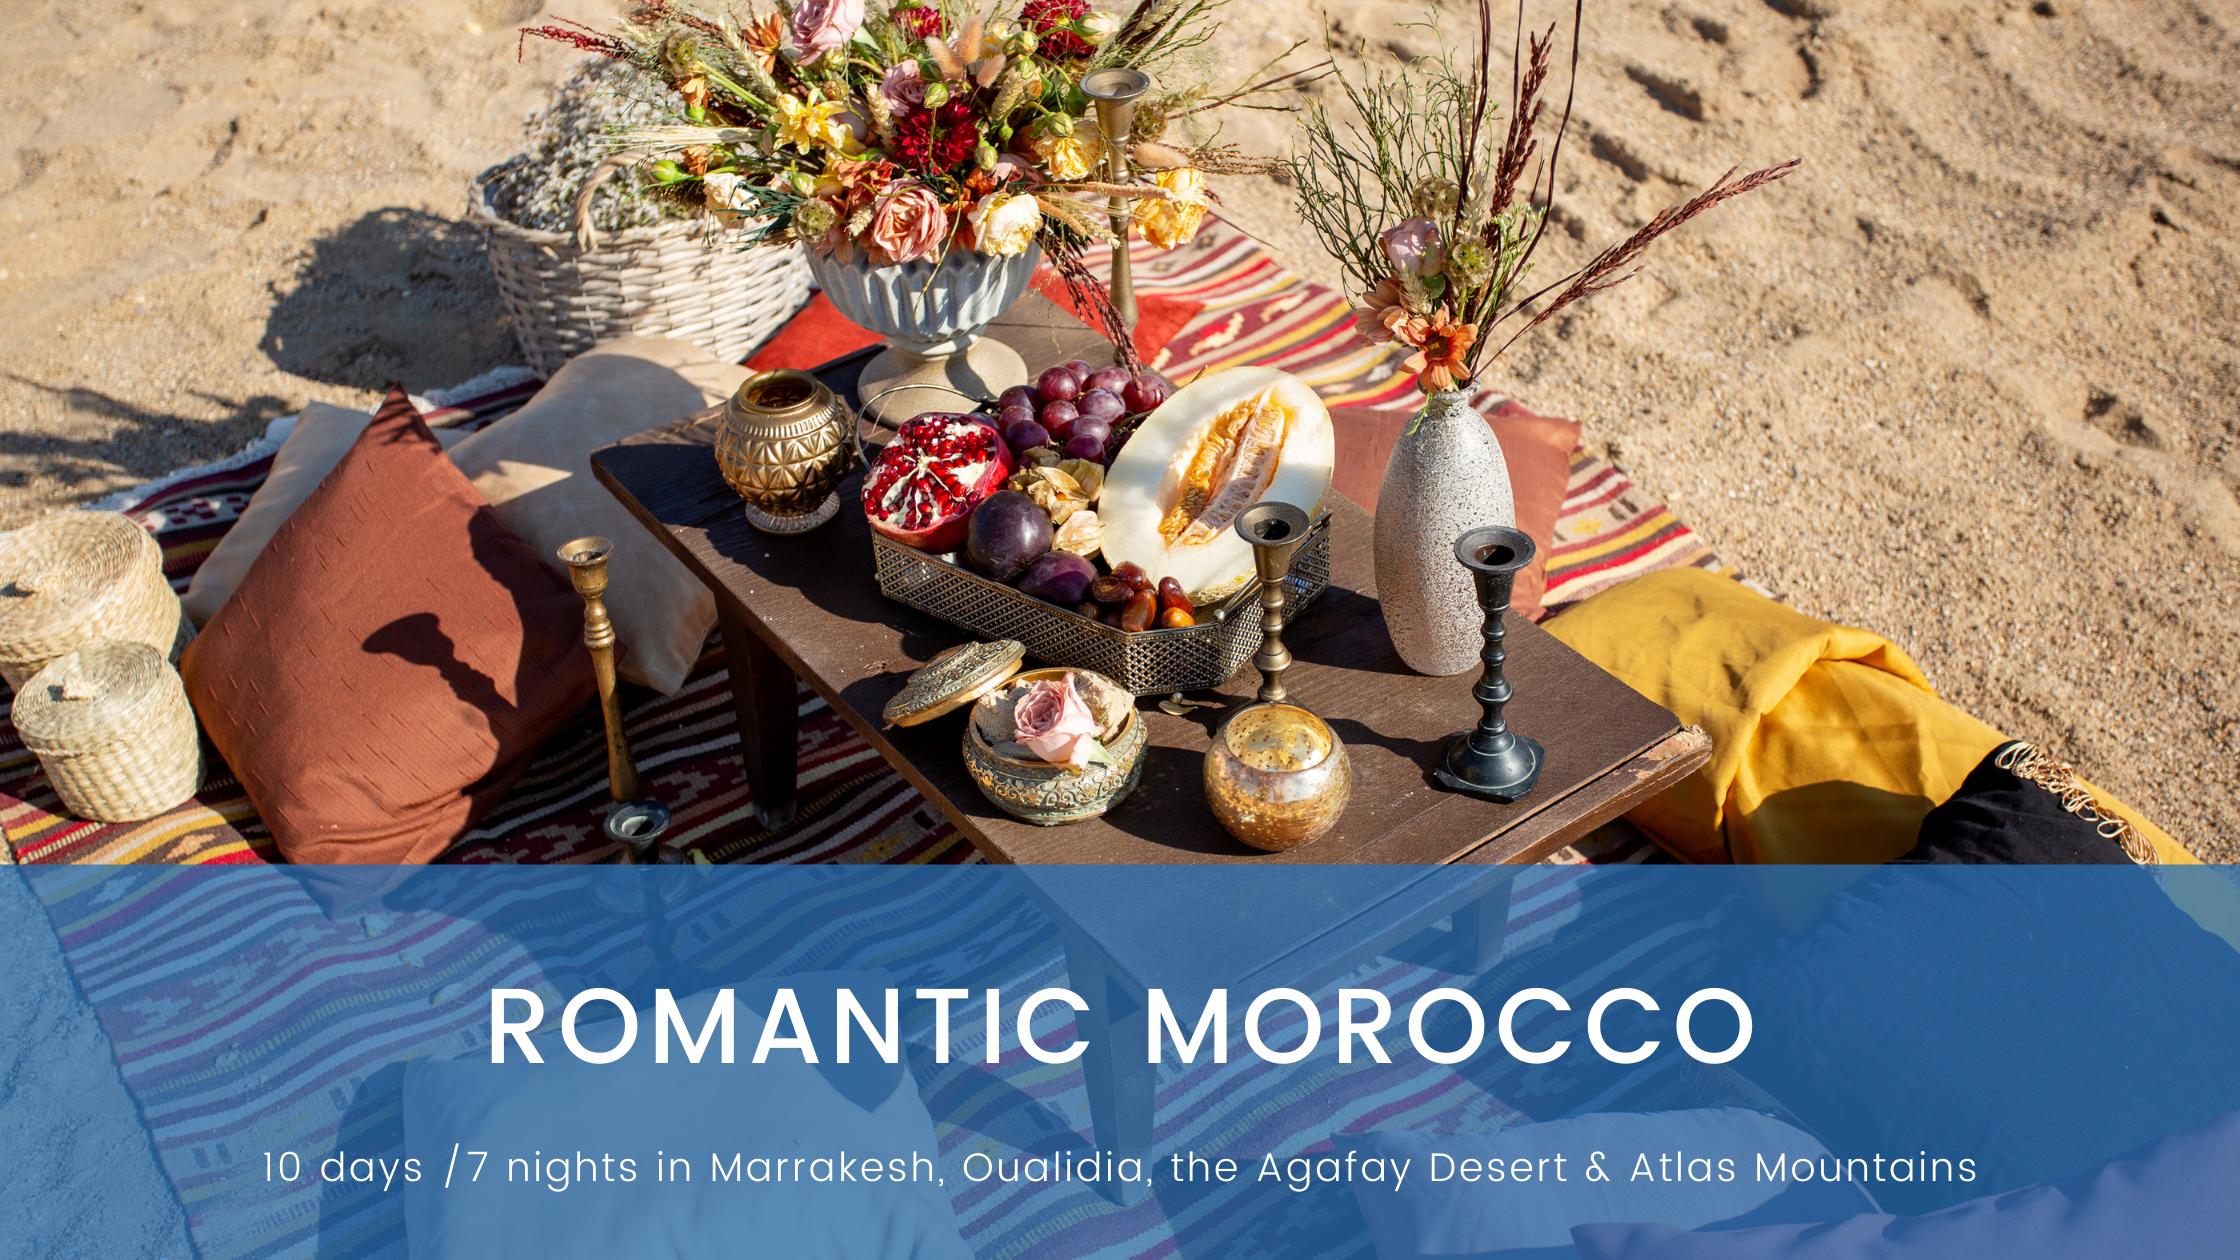 Romantic Morocco